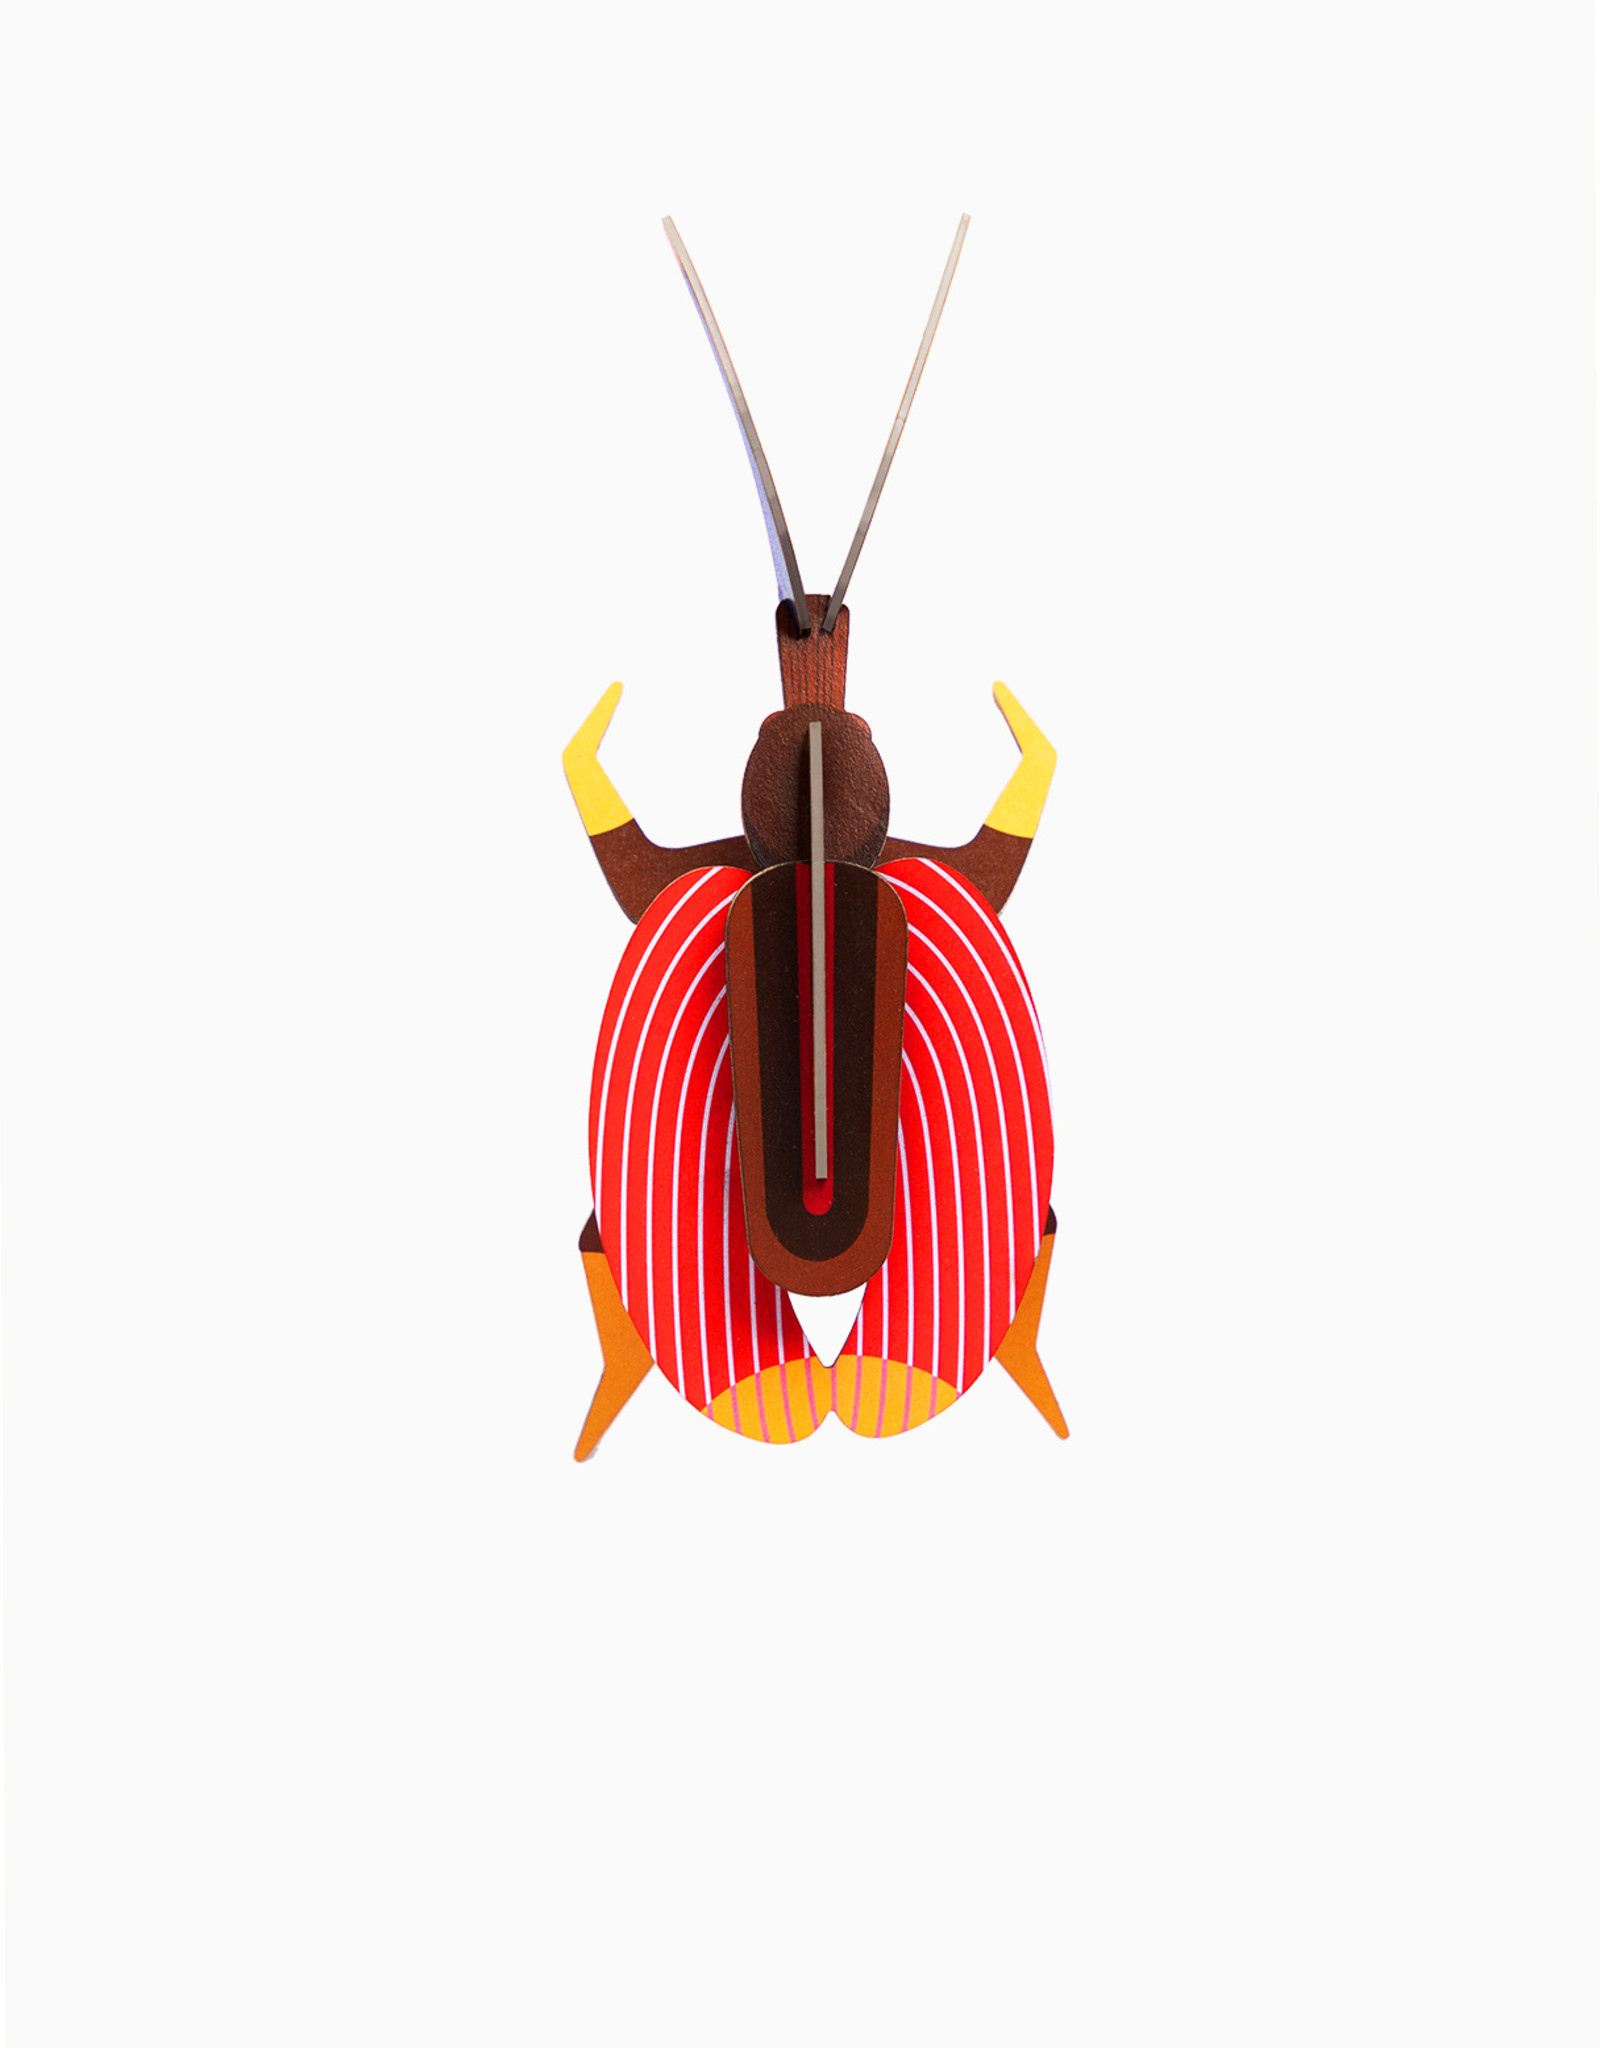 Studioroof Studio Roof Wall Decor Violin Beetle